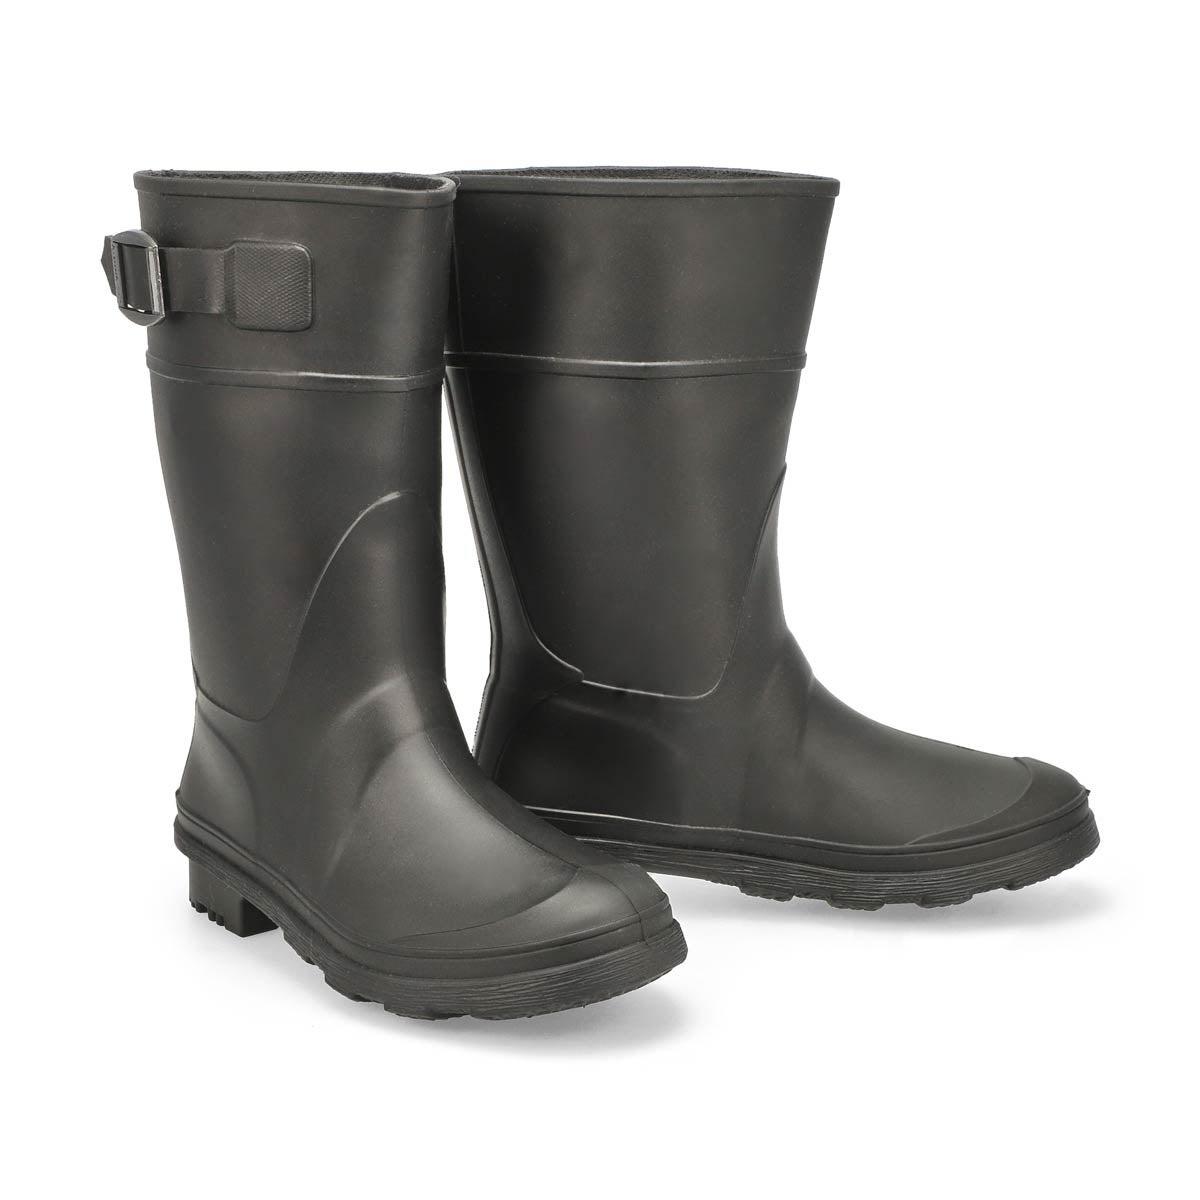 Boys' RAINDROPS black waterproof rain boots